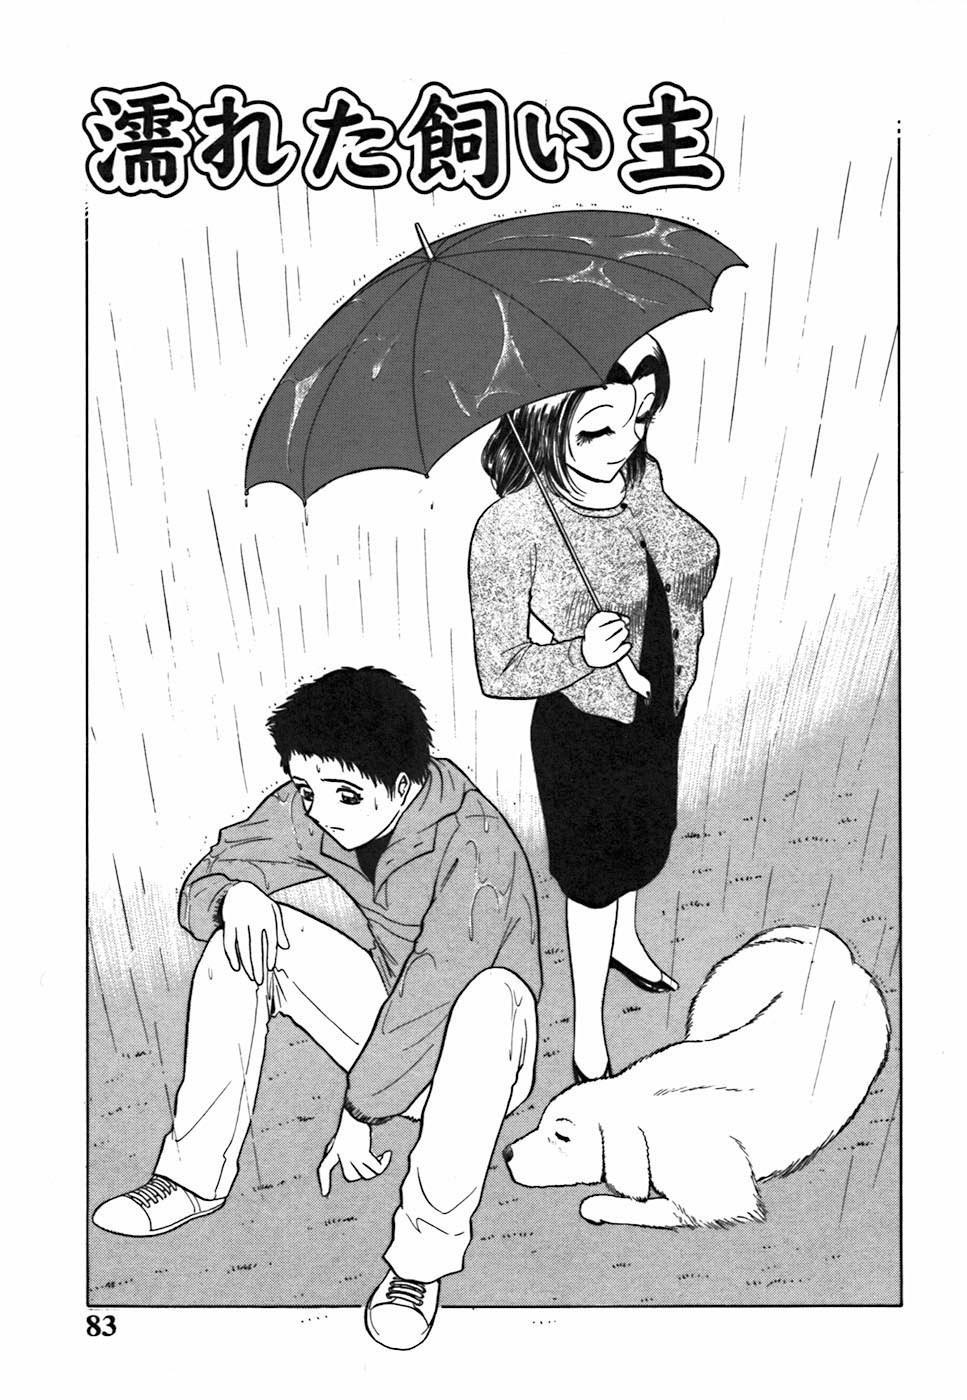 Kimi ga Nozomu Katachi | Appearance for which you hope 82